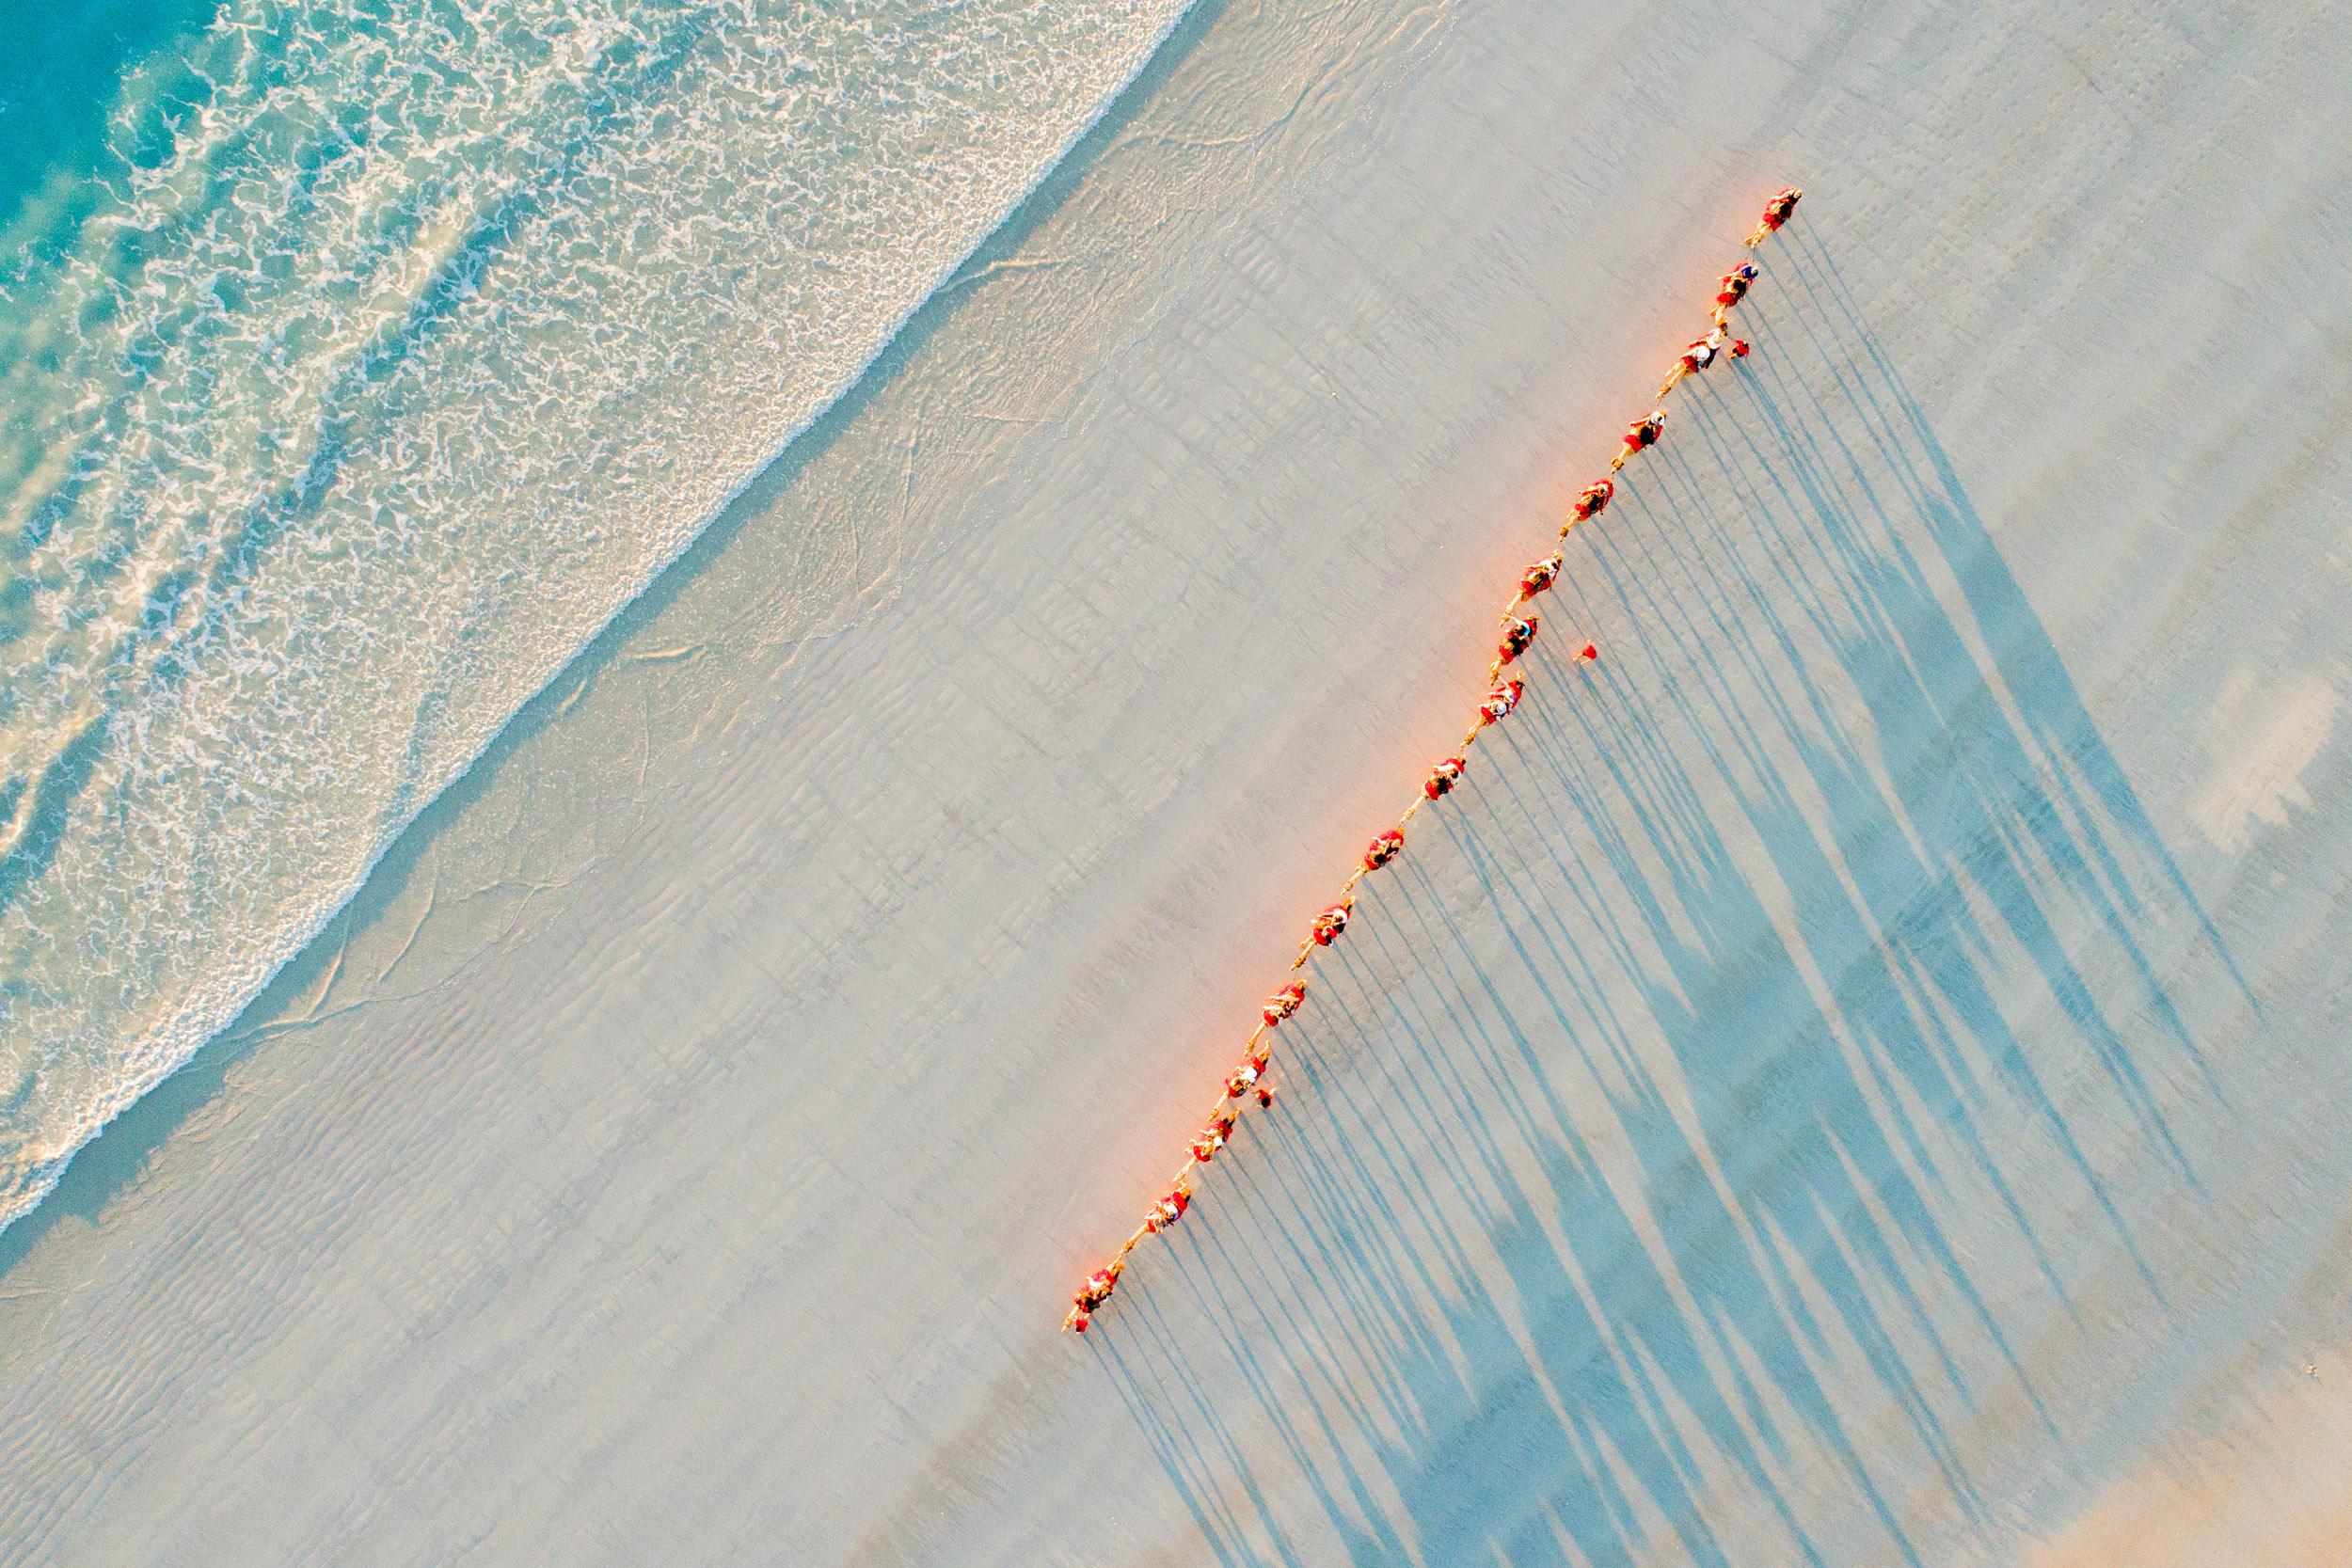 camel-ride-aerial-broome-western-australia.jpg